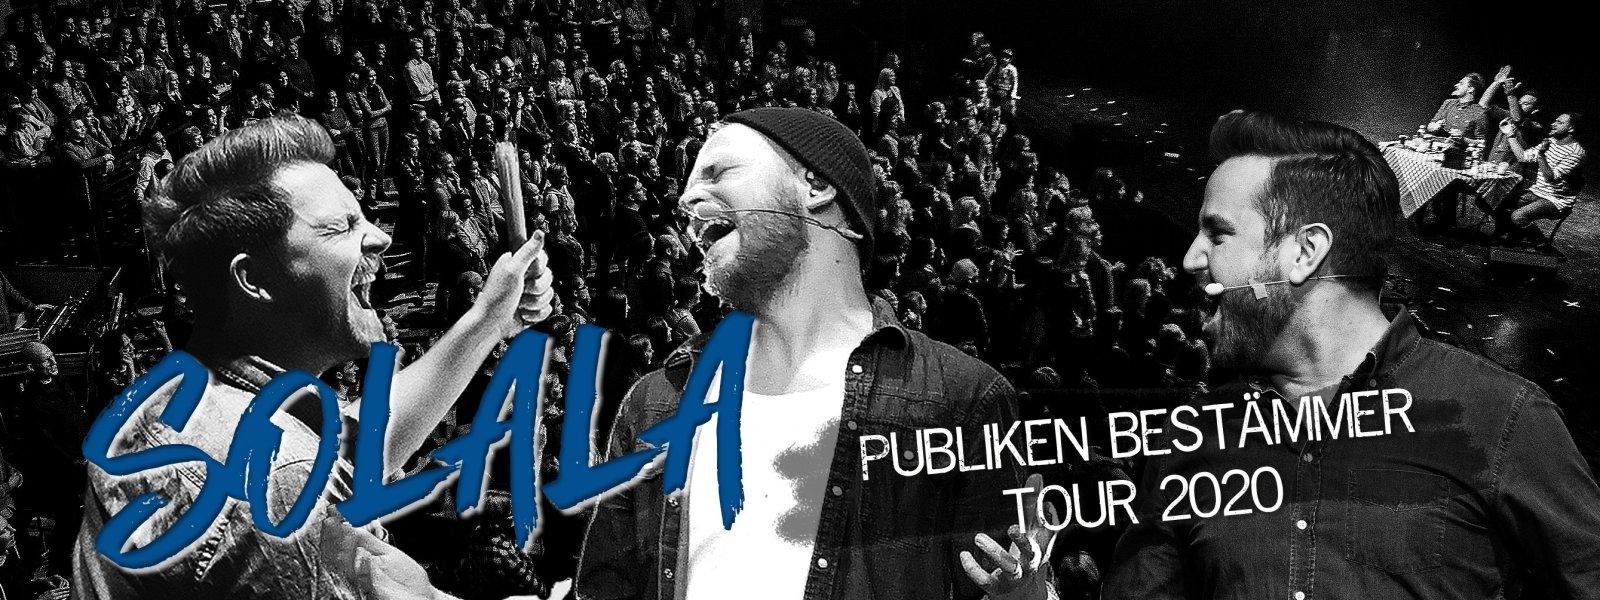 SOLALA – Publiken Bestämmer Tour